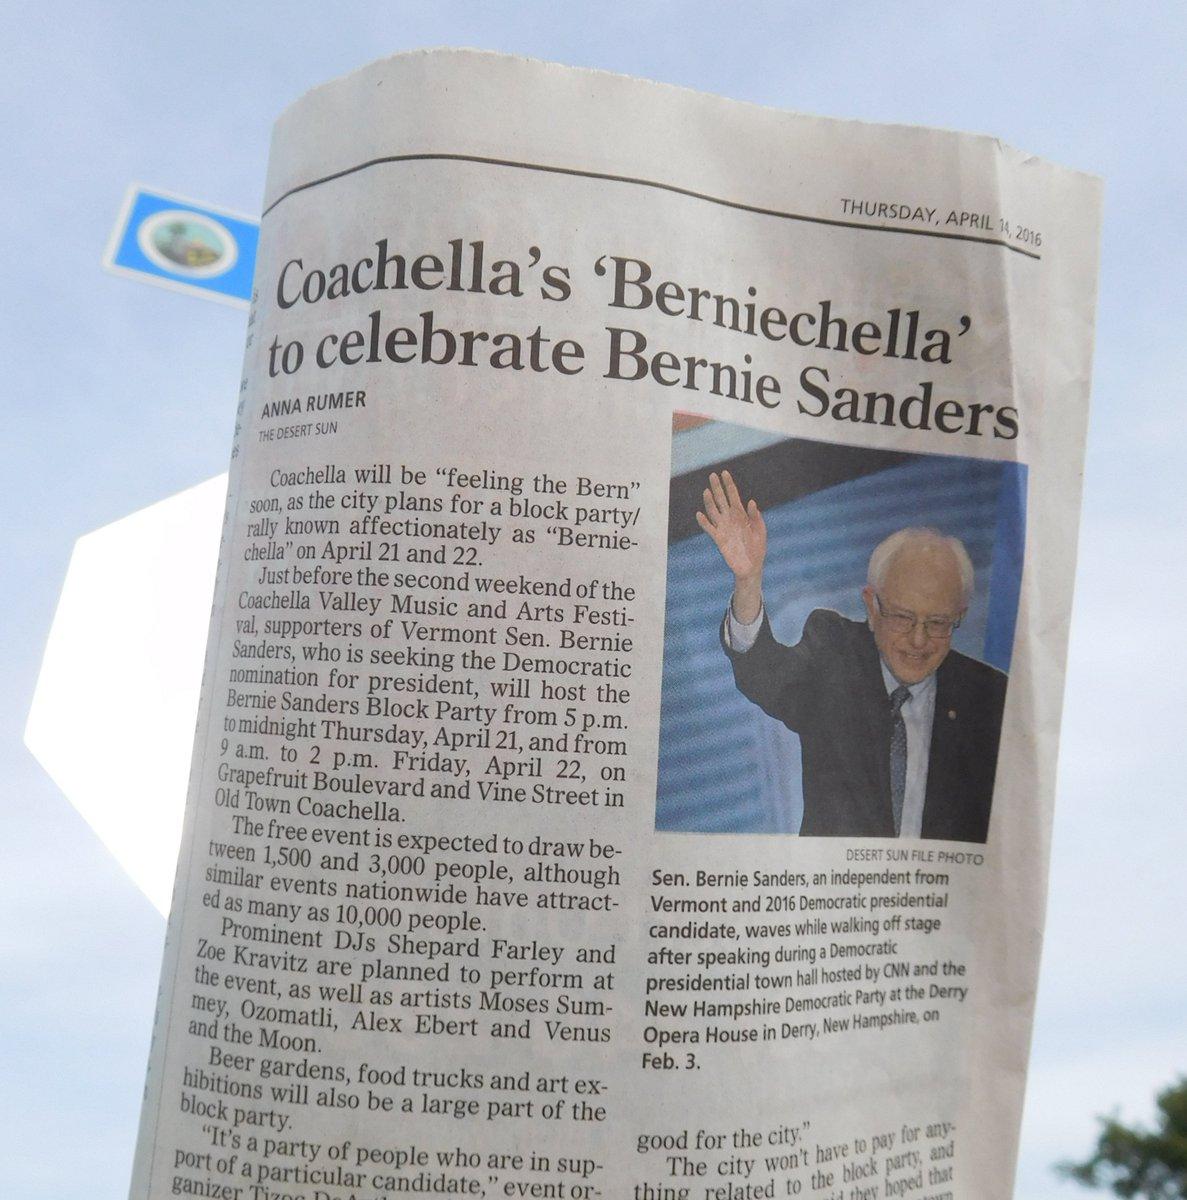 Coachella's #BERNIECHELLA to celebrate Bernie Sanders via @MyDesert https://t.co/unMu1P3zGi https://t.co/IeyP2wKp1X https://t.co/Ct56nMoDS6